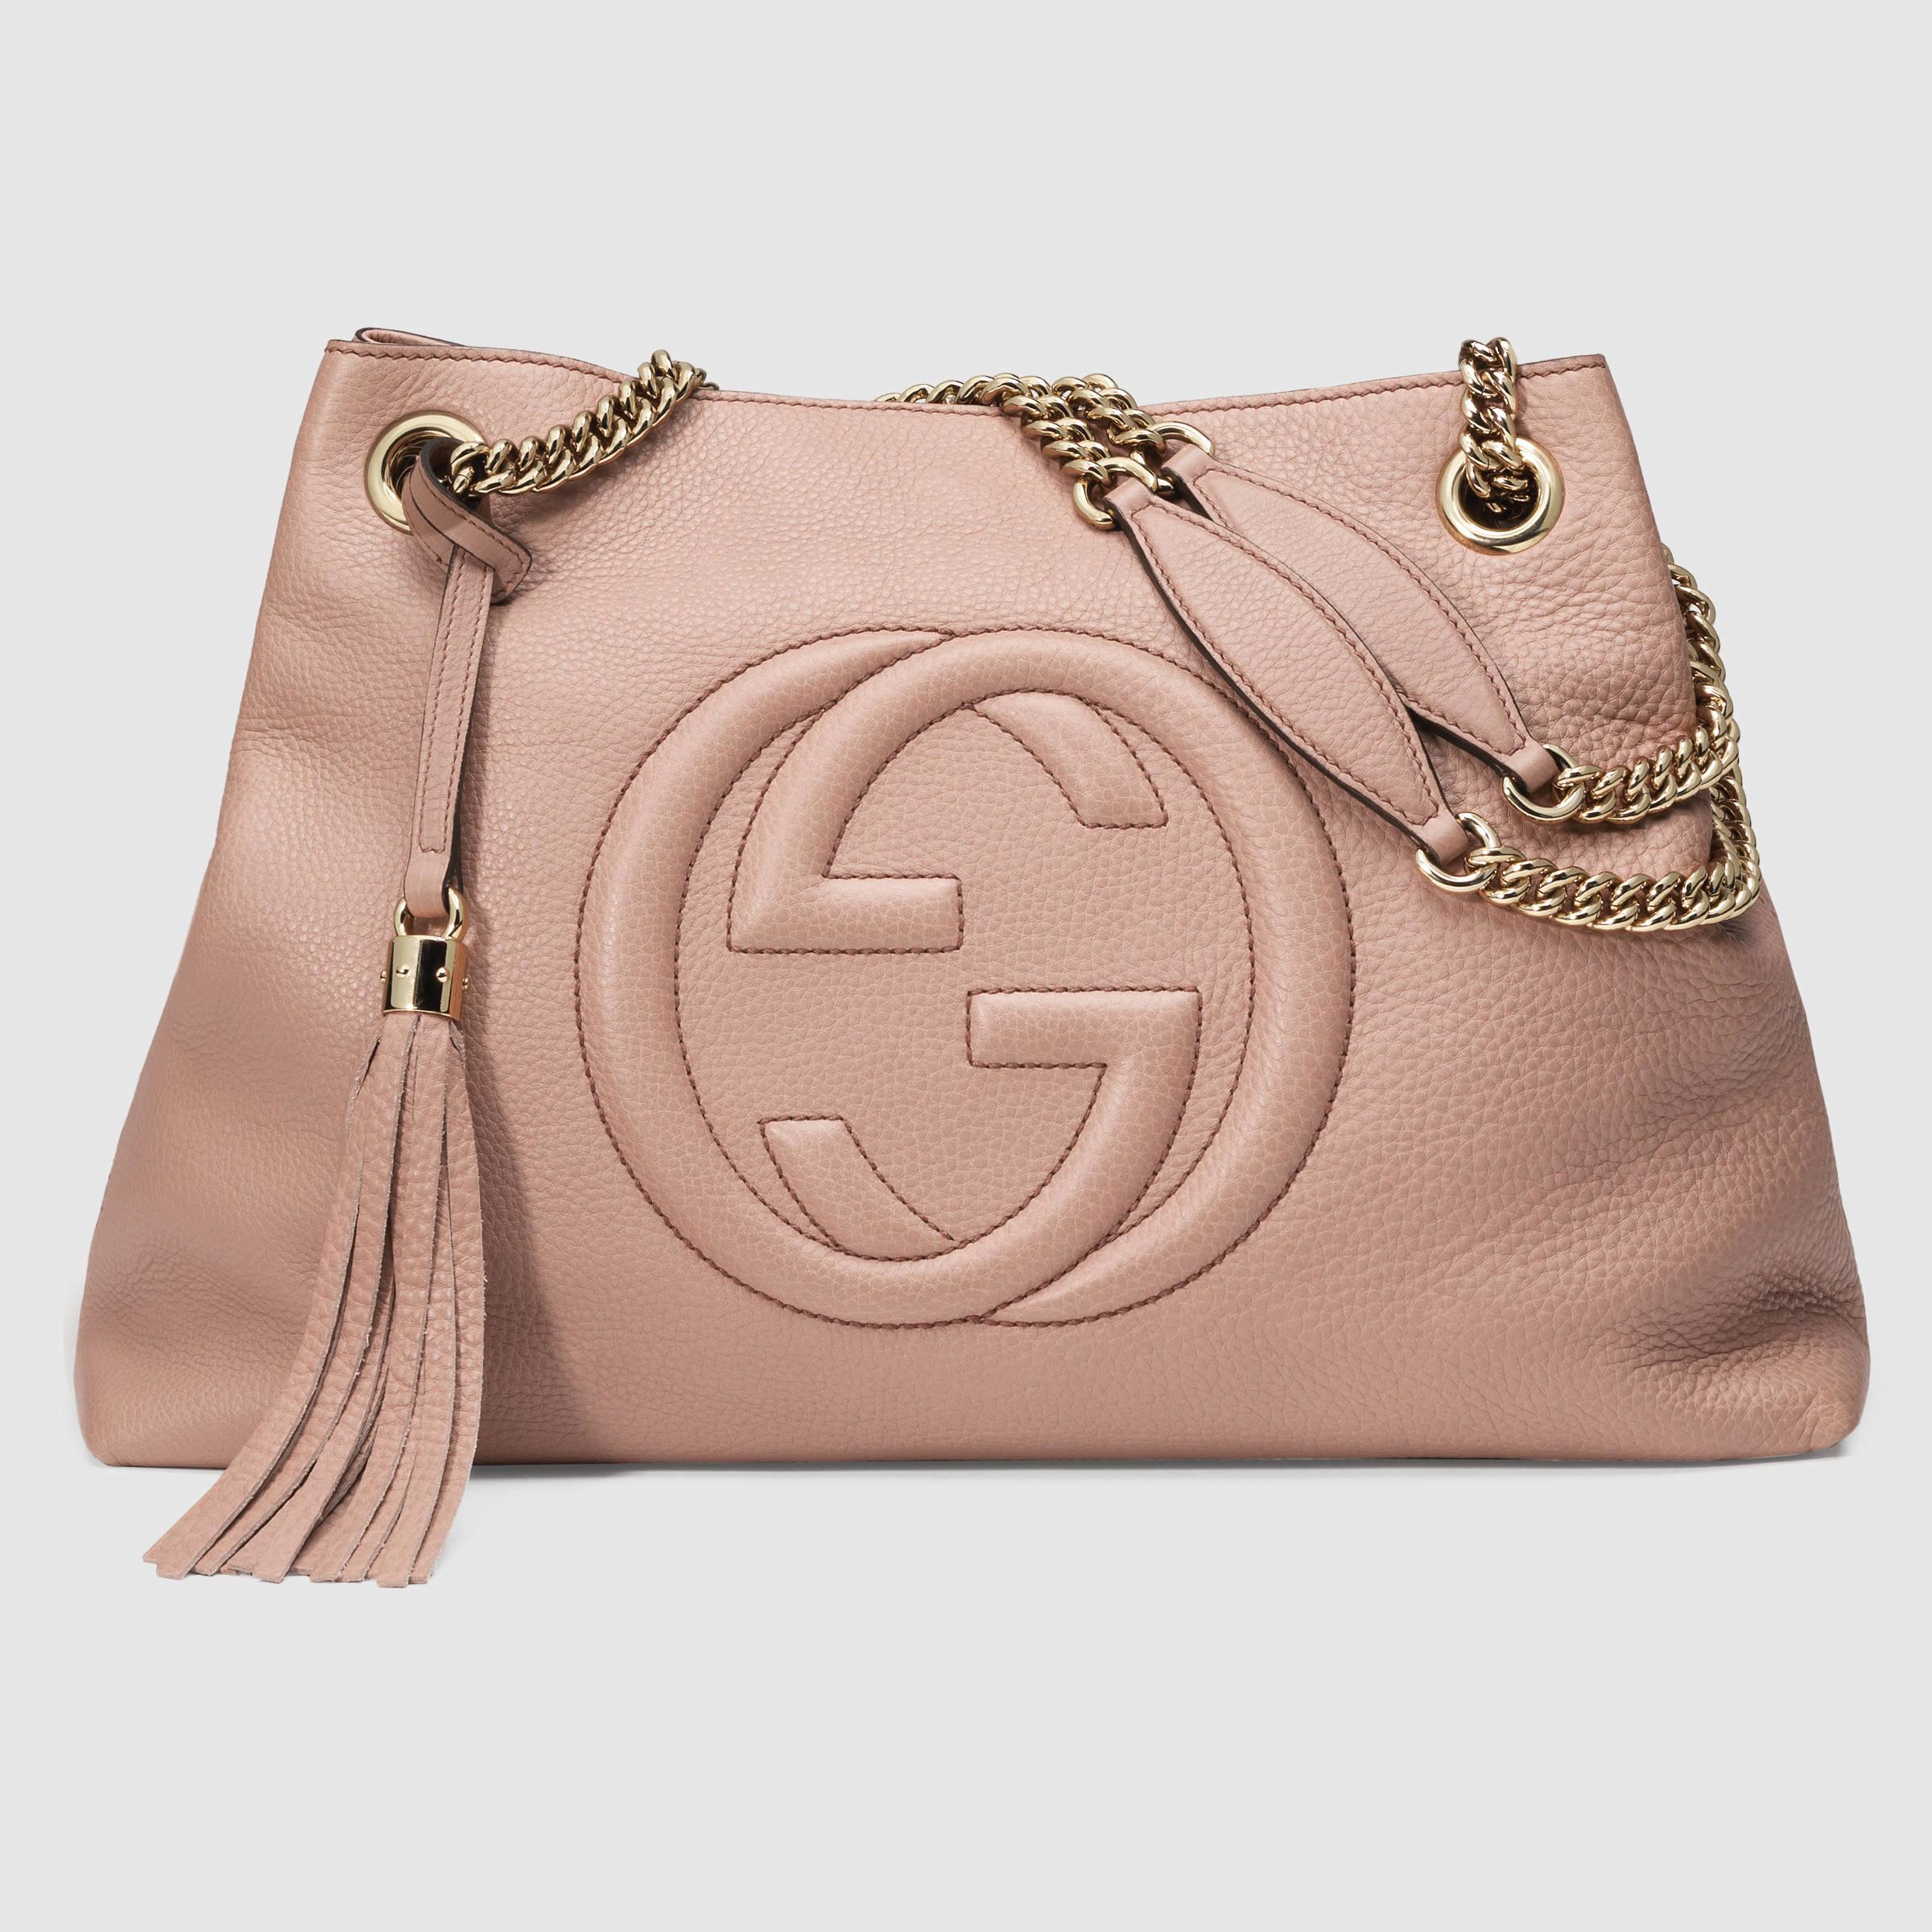 3166b2ed56d8 Lyst Gucci Soho Leather Shoulder Bag In Pink